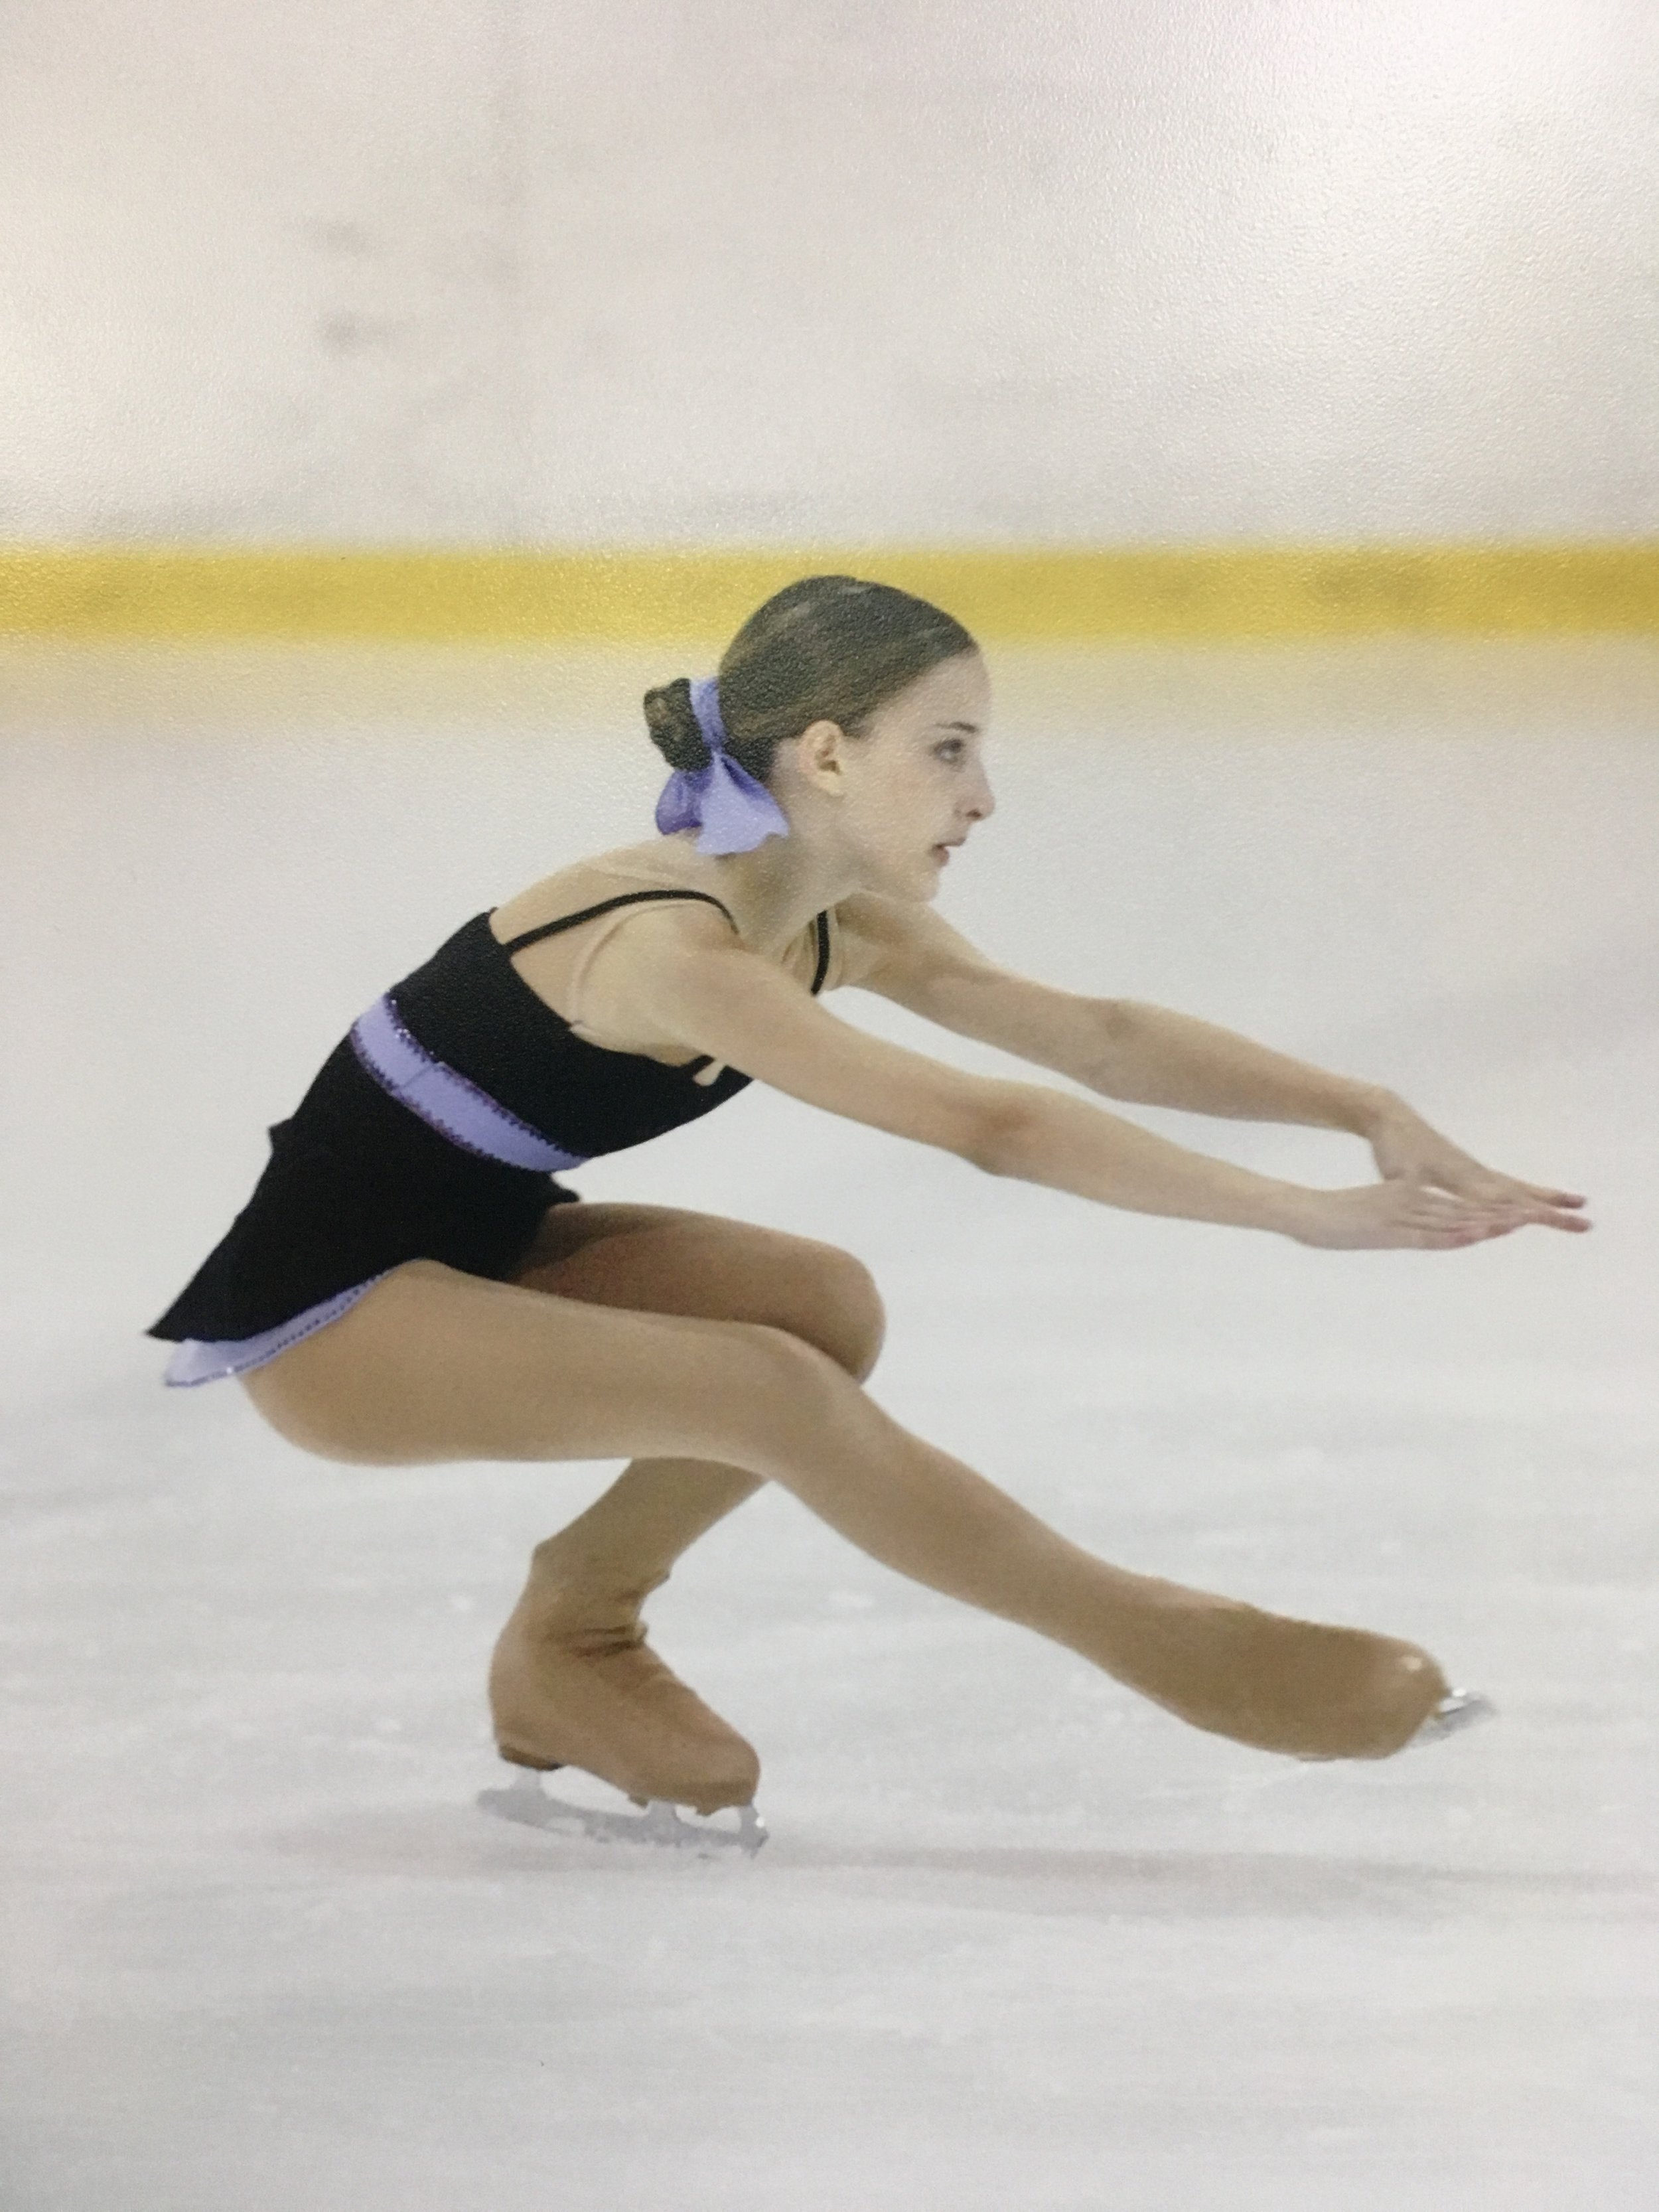 Laura_Snyderman_skating2.jpg